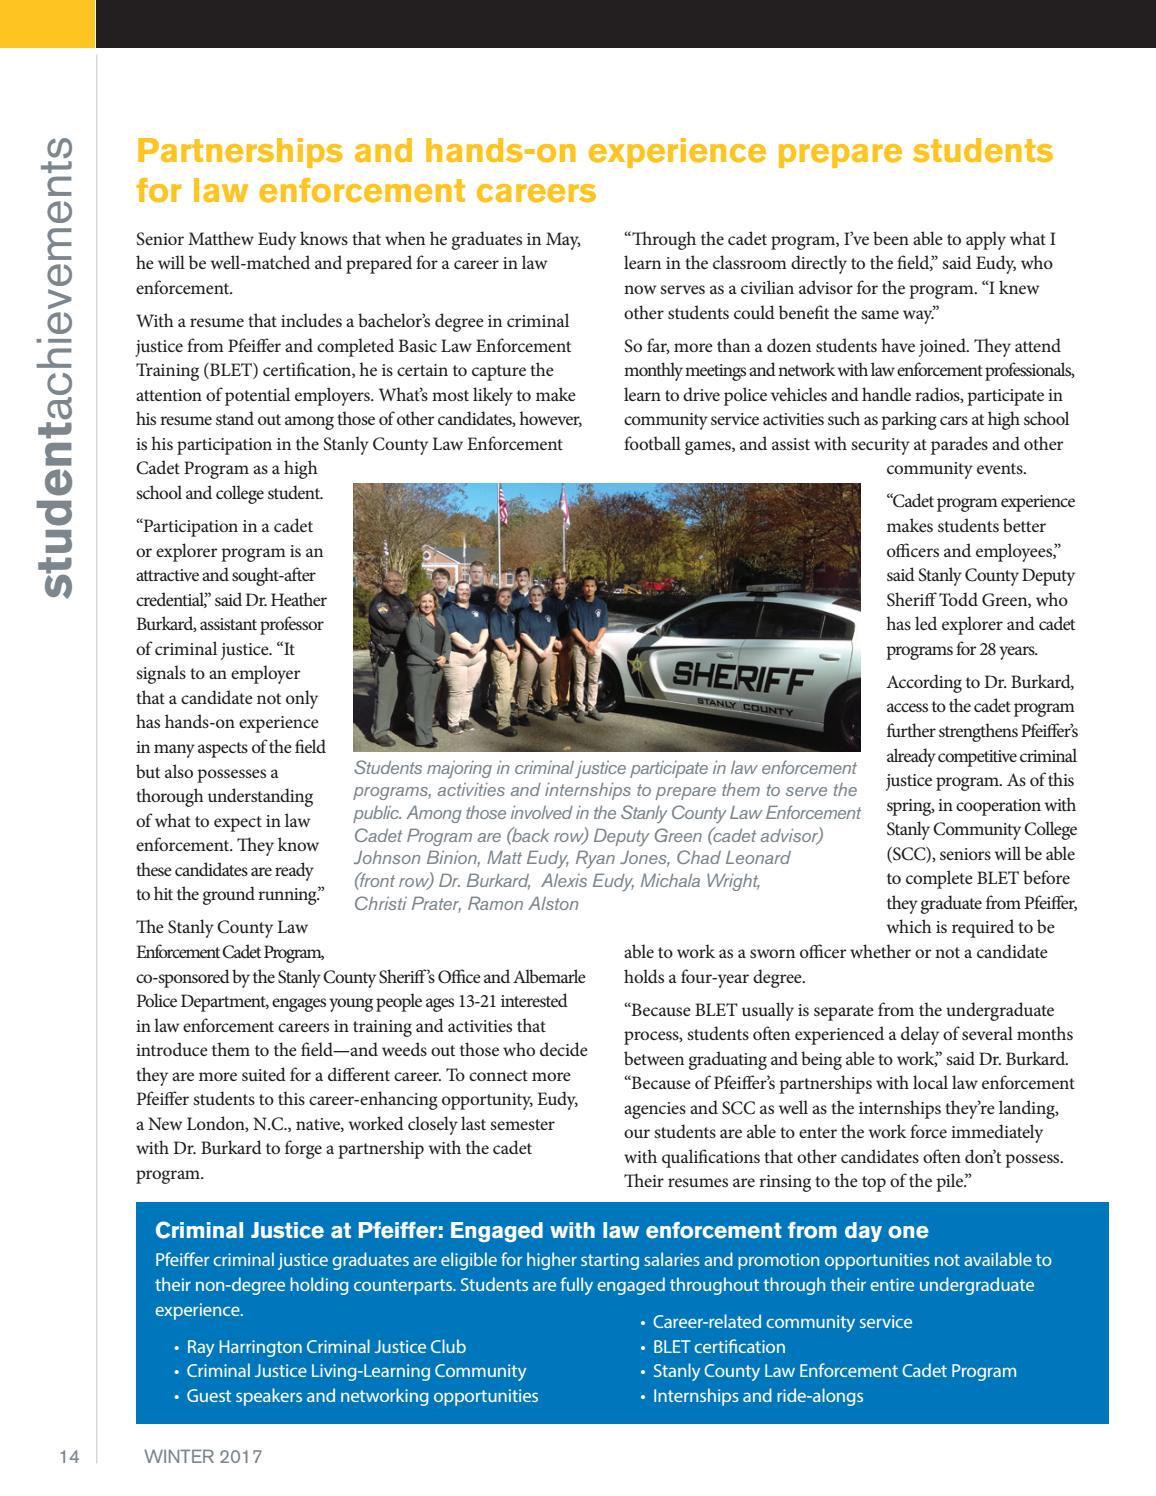 Pfeiffer Alumni Magazine 2016 By Pfeiffer University Marketing